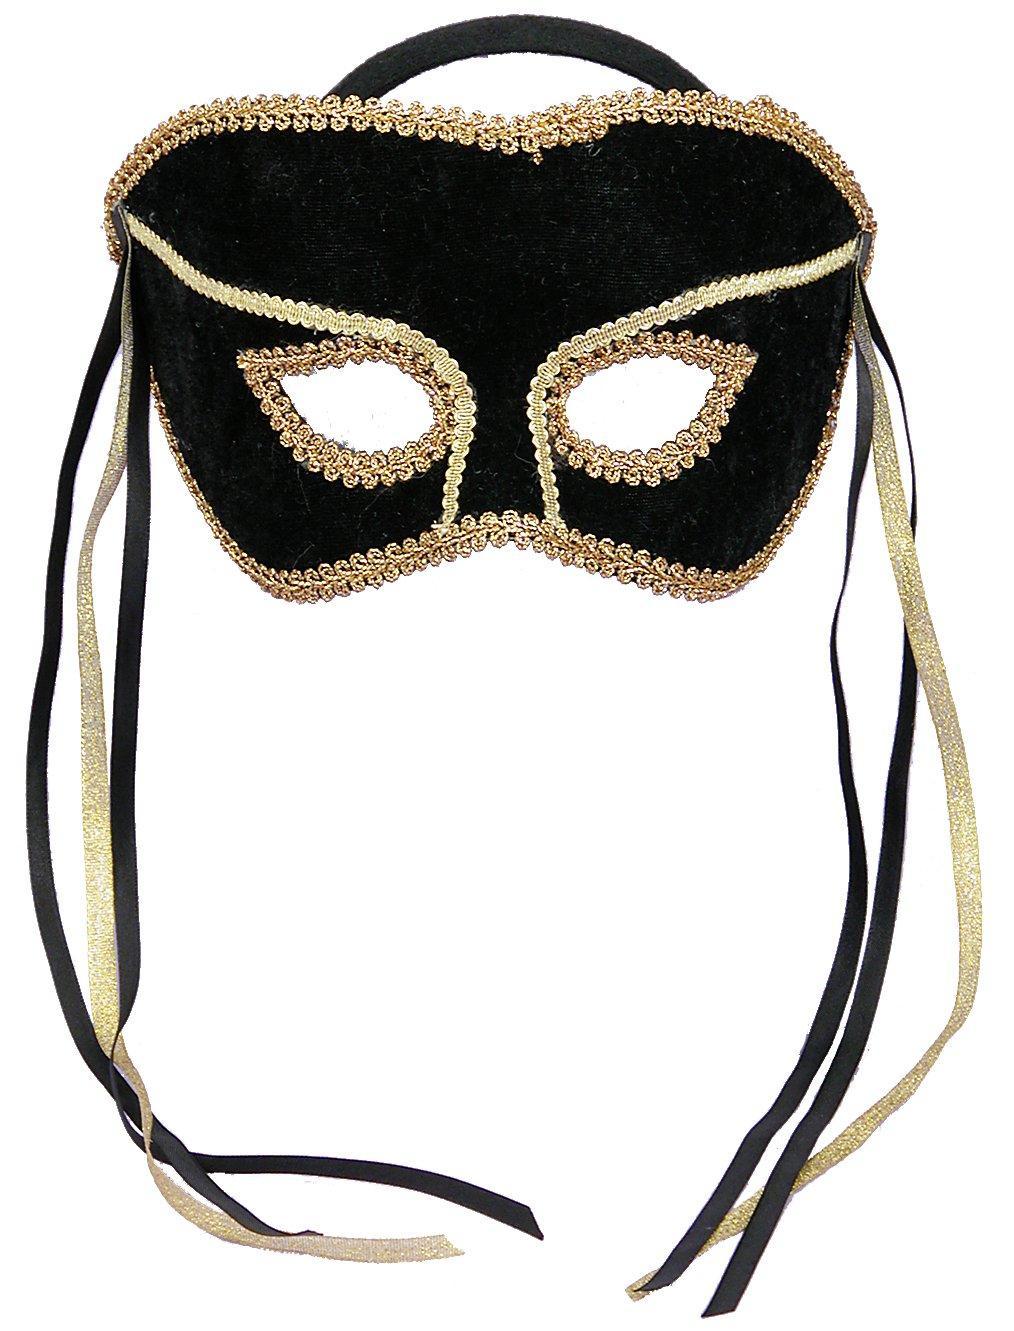 Black and Gold Masquerade Mask